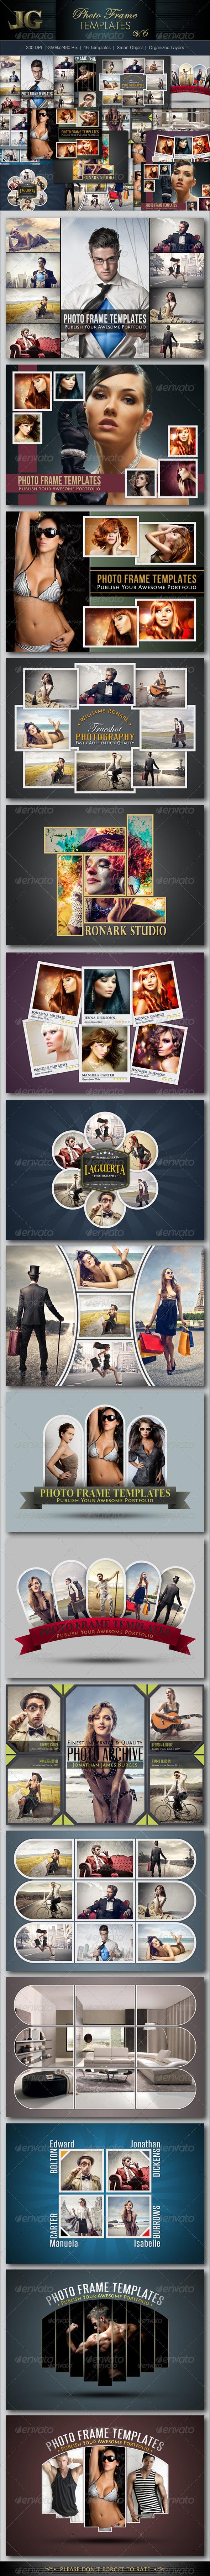 Photo Frame Templates V6 - Artistic Photo Templates